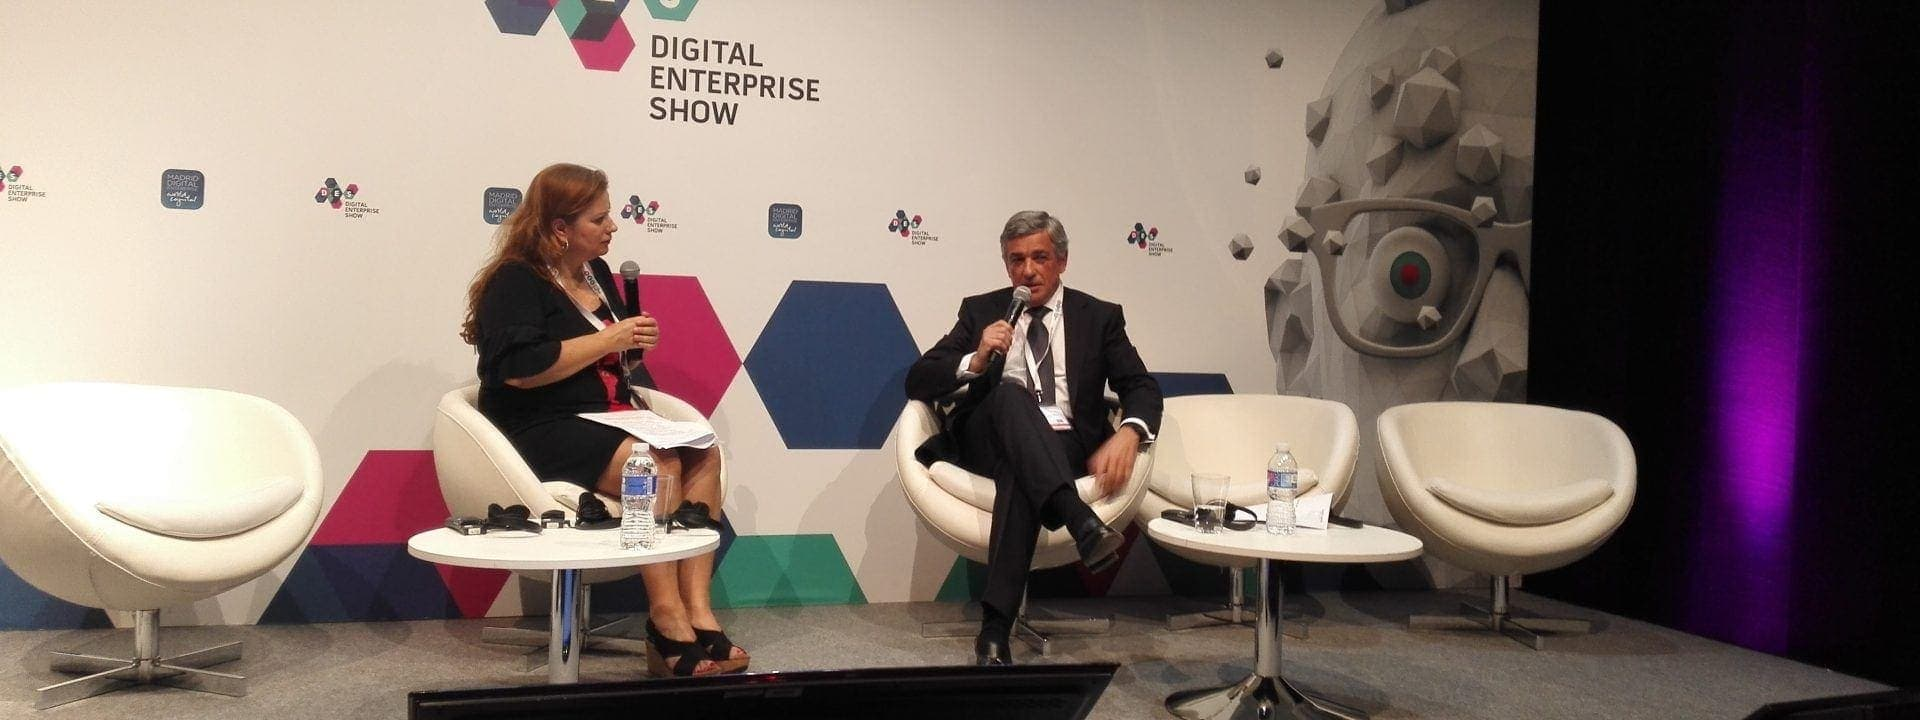 Federico Flórez reconocido como Mejor Líder Digital de 2016